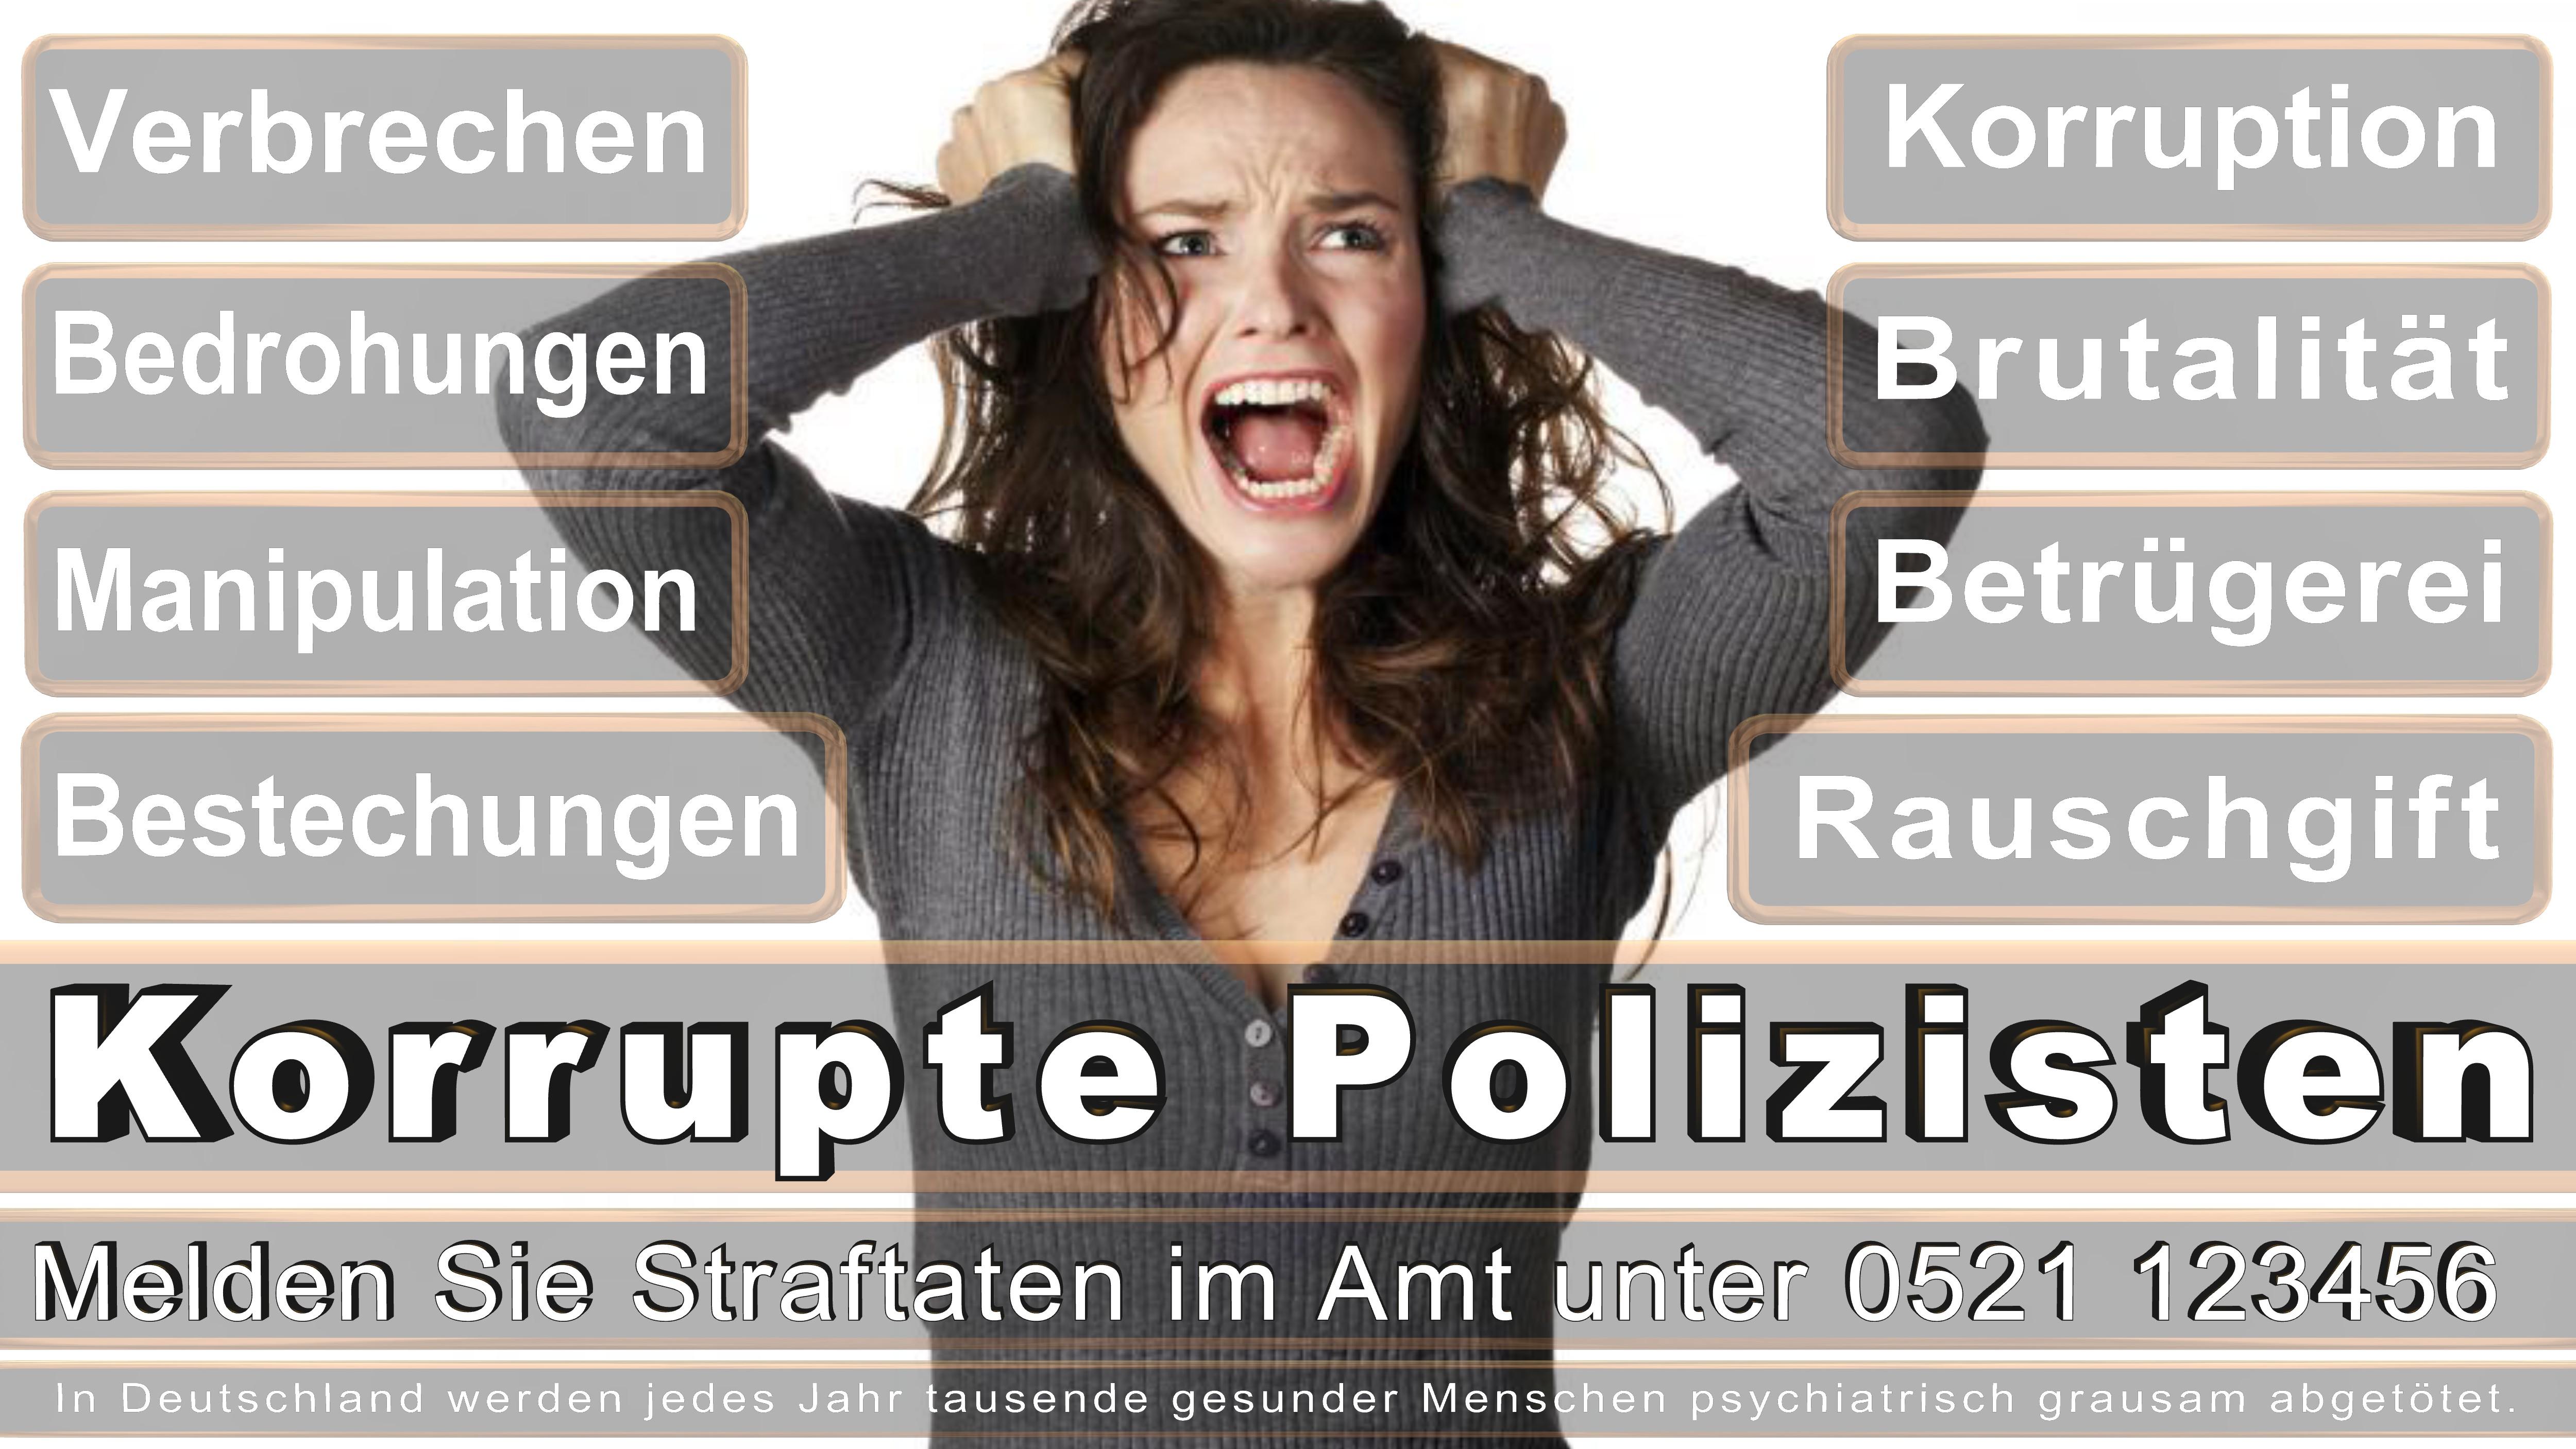 Polizei-Bielefeld-Polizei-Bielefeld-Polizei-Bielefeld (181)